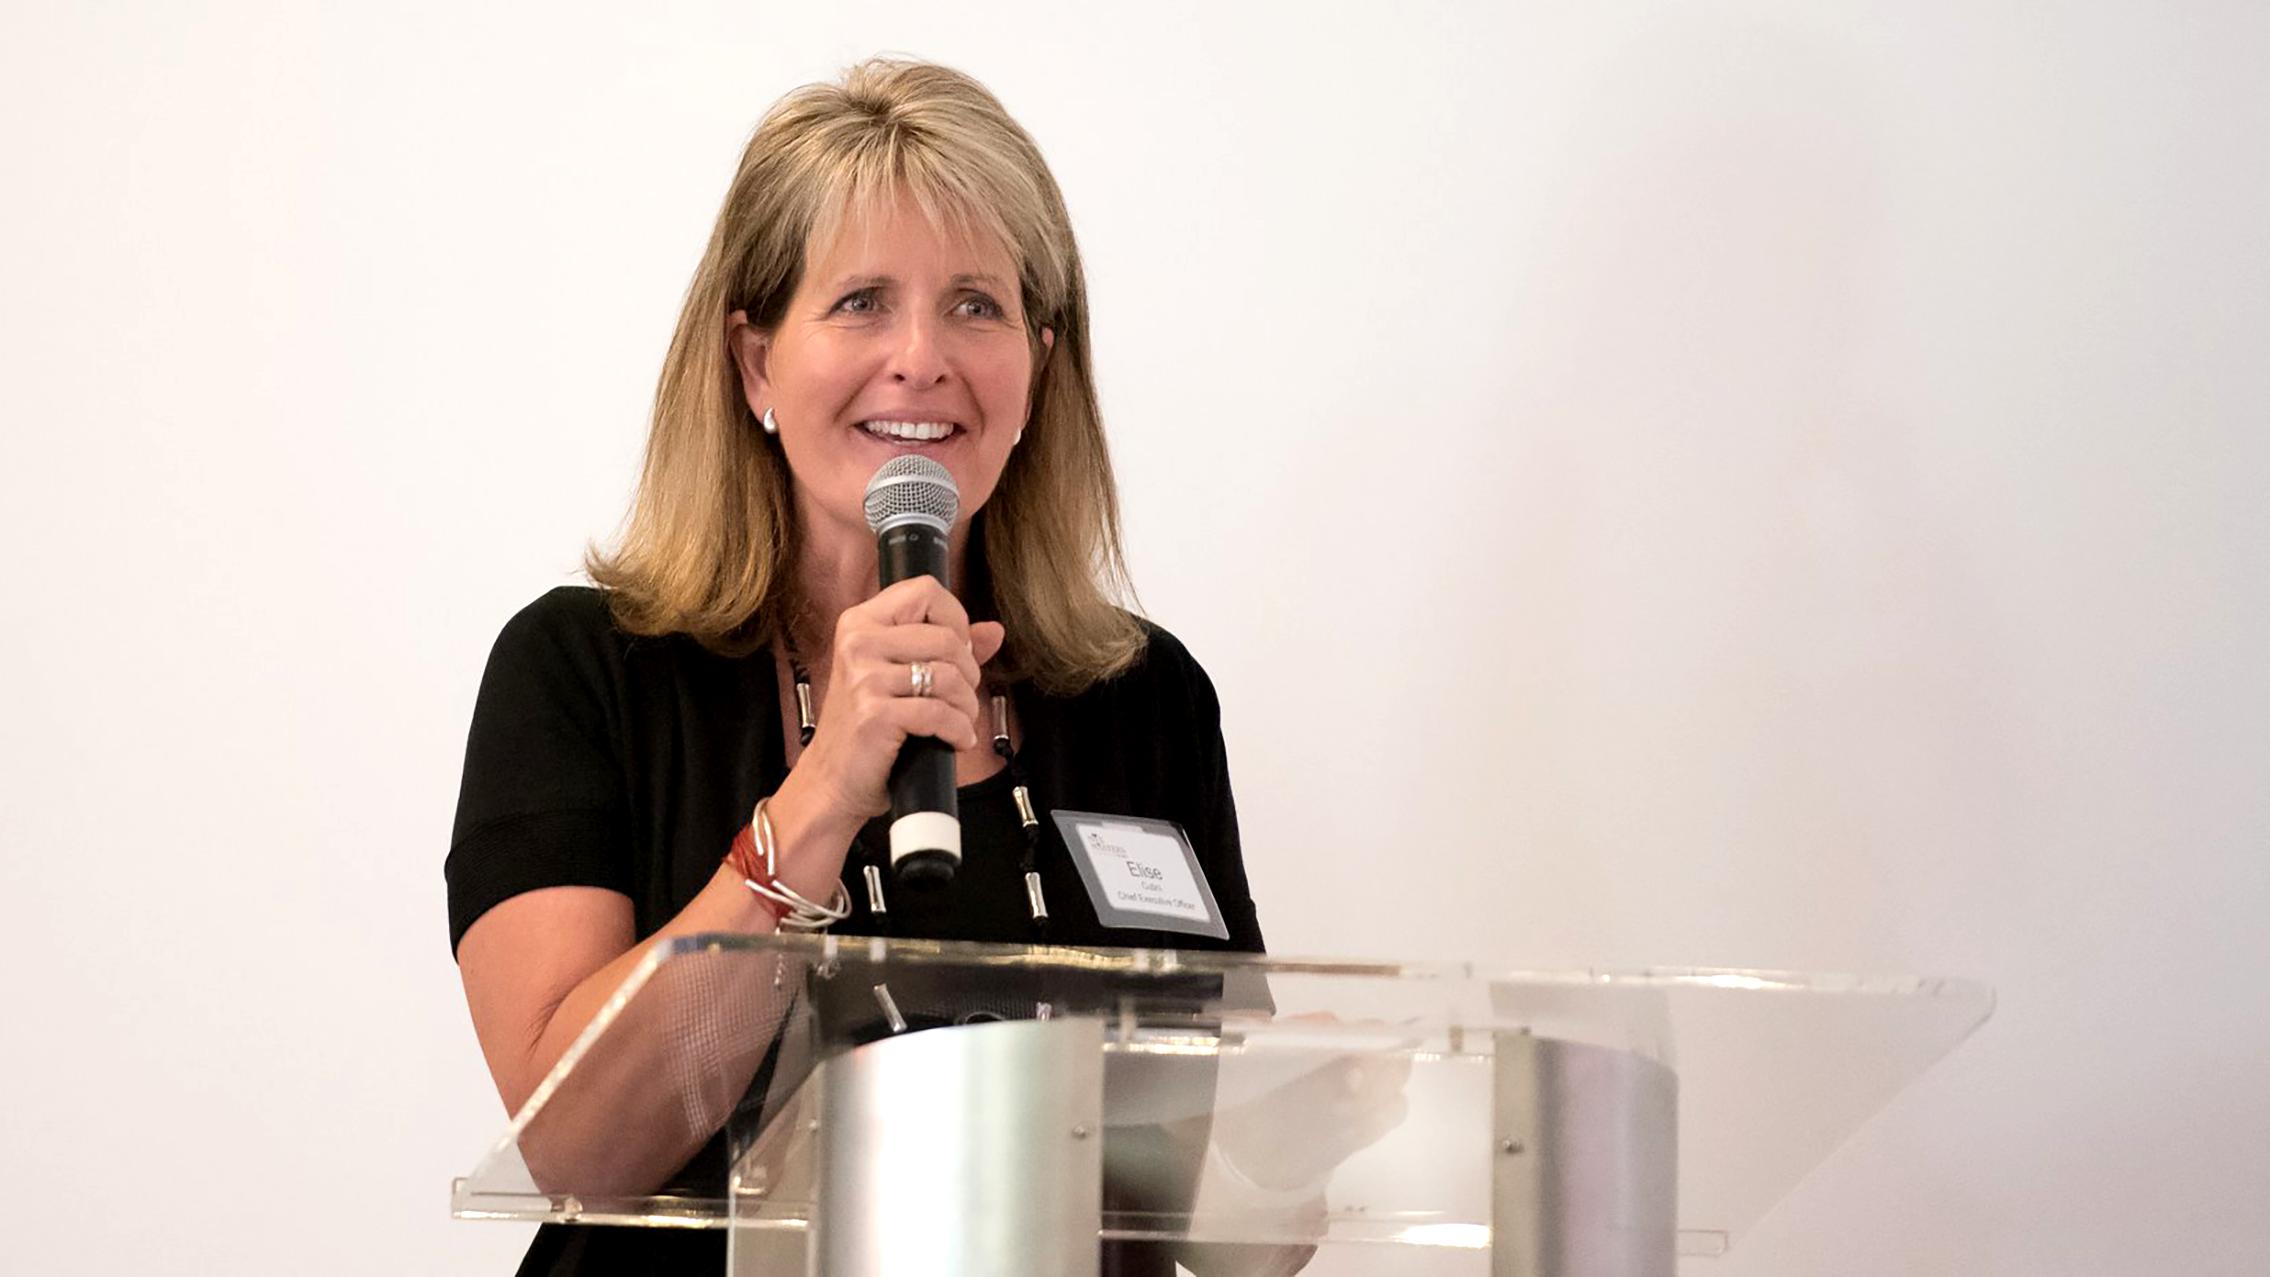 Elise Cutini, Pivotal CEO Digital